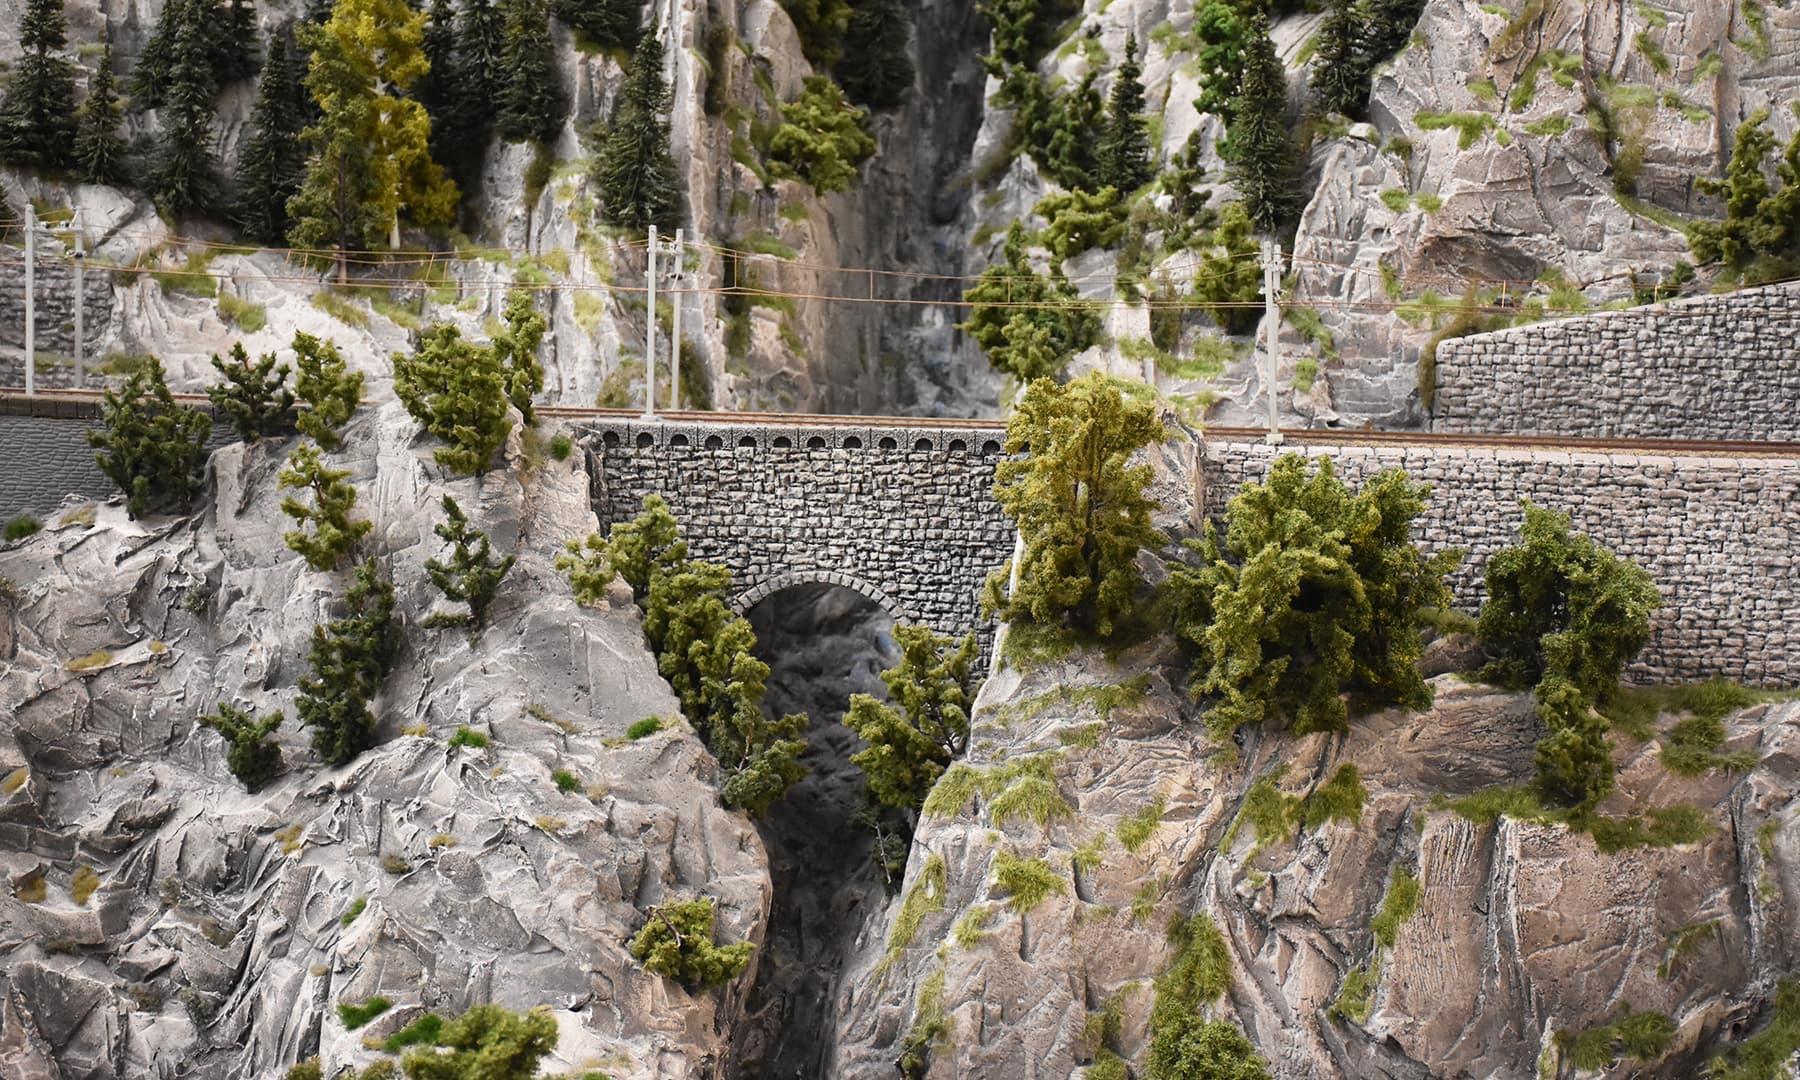 پہاڑ پر بنا پل—تصویر رمضان رفیق